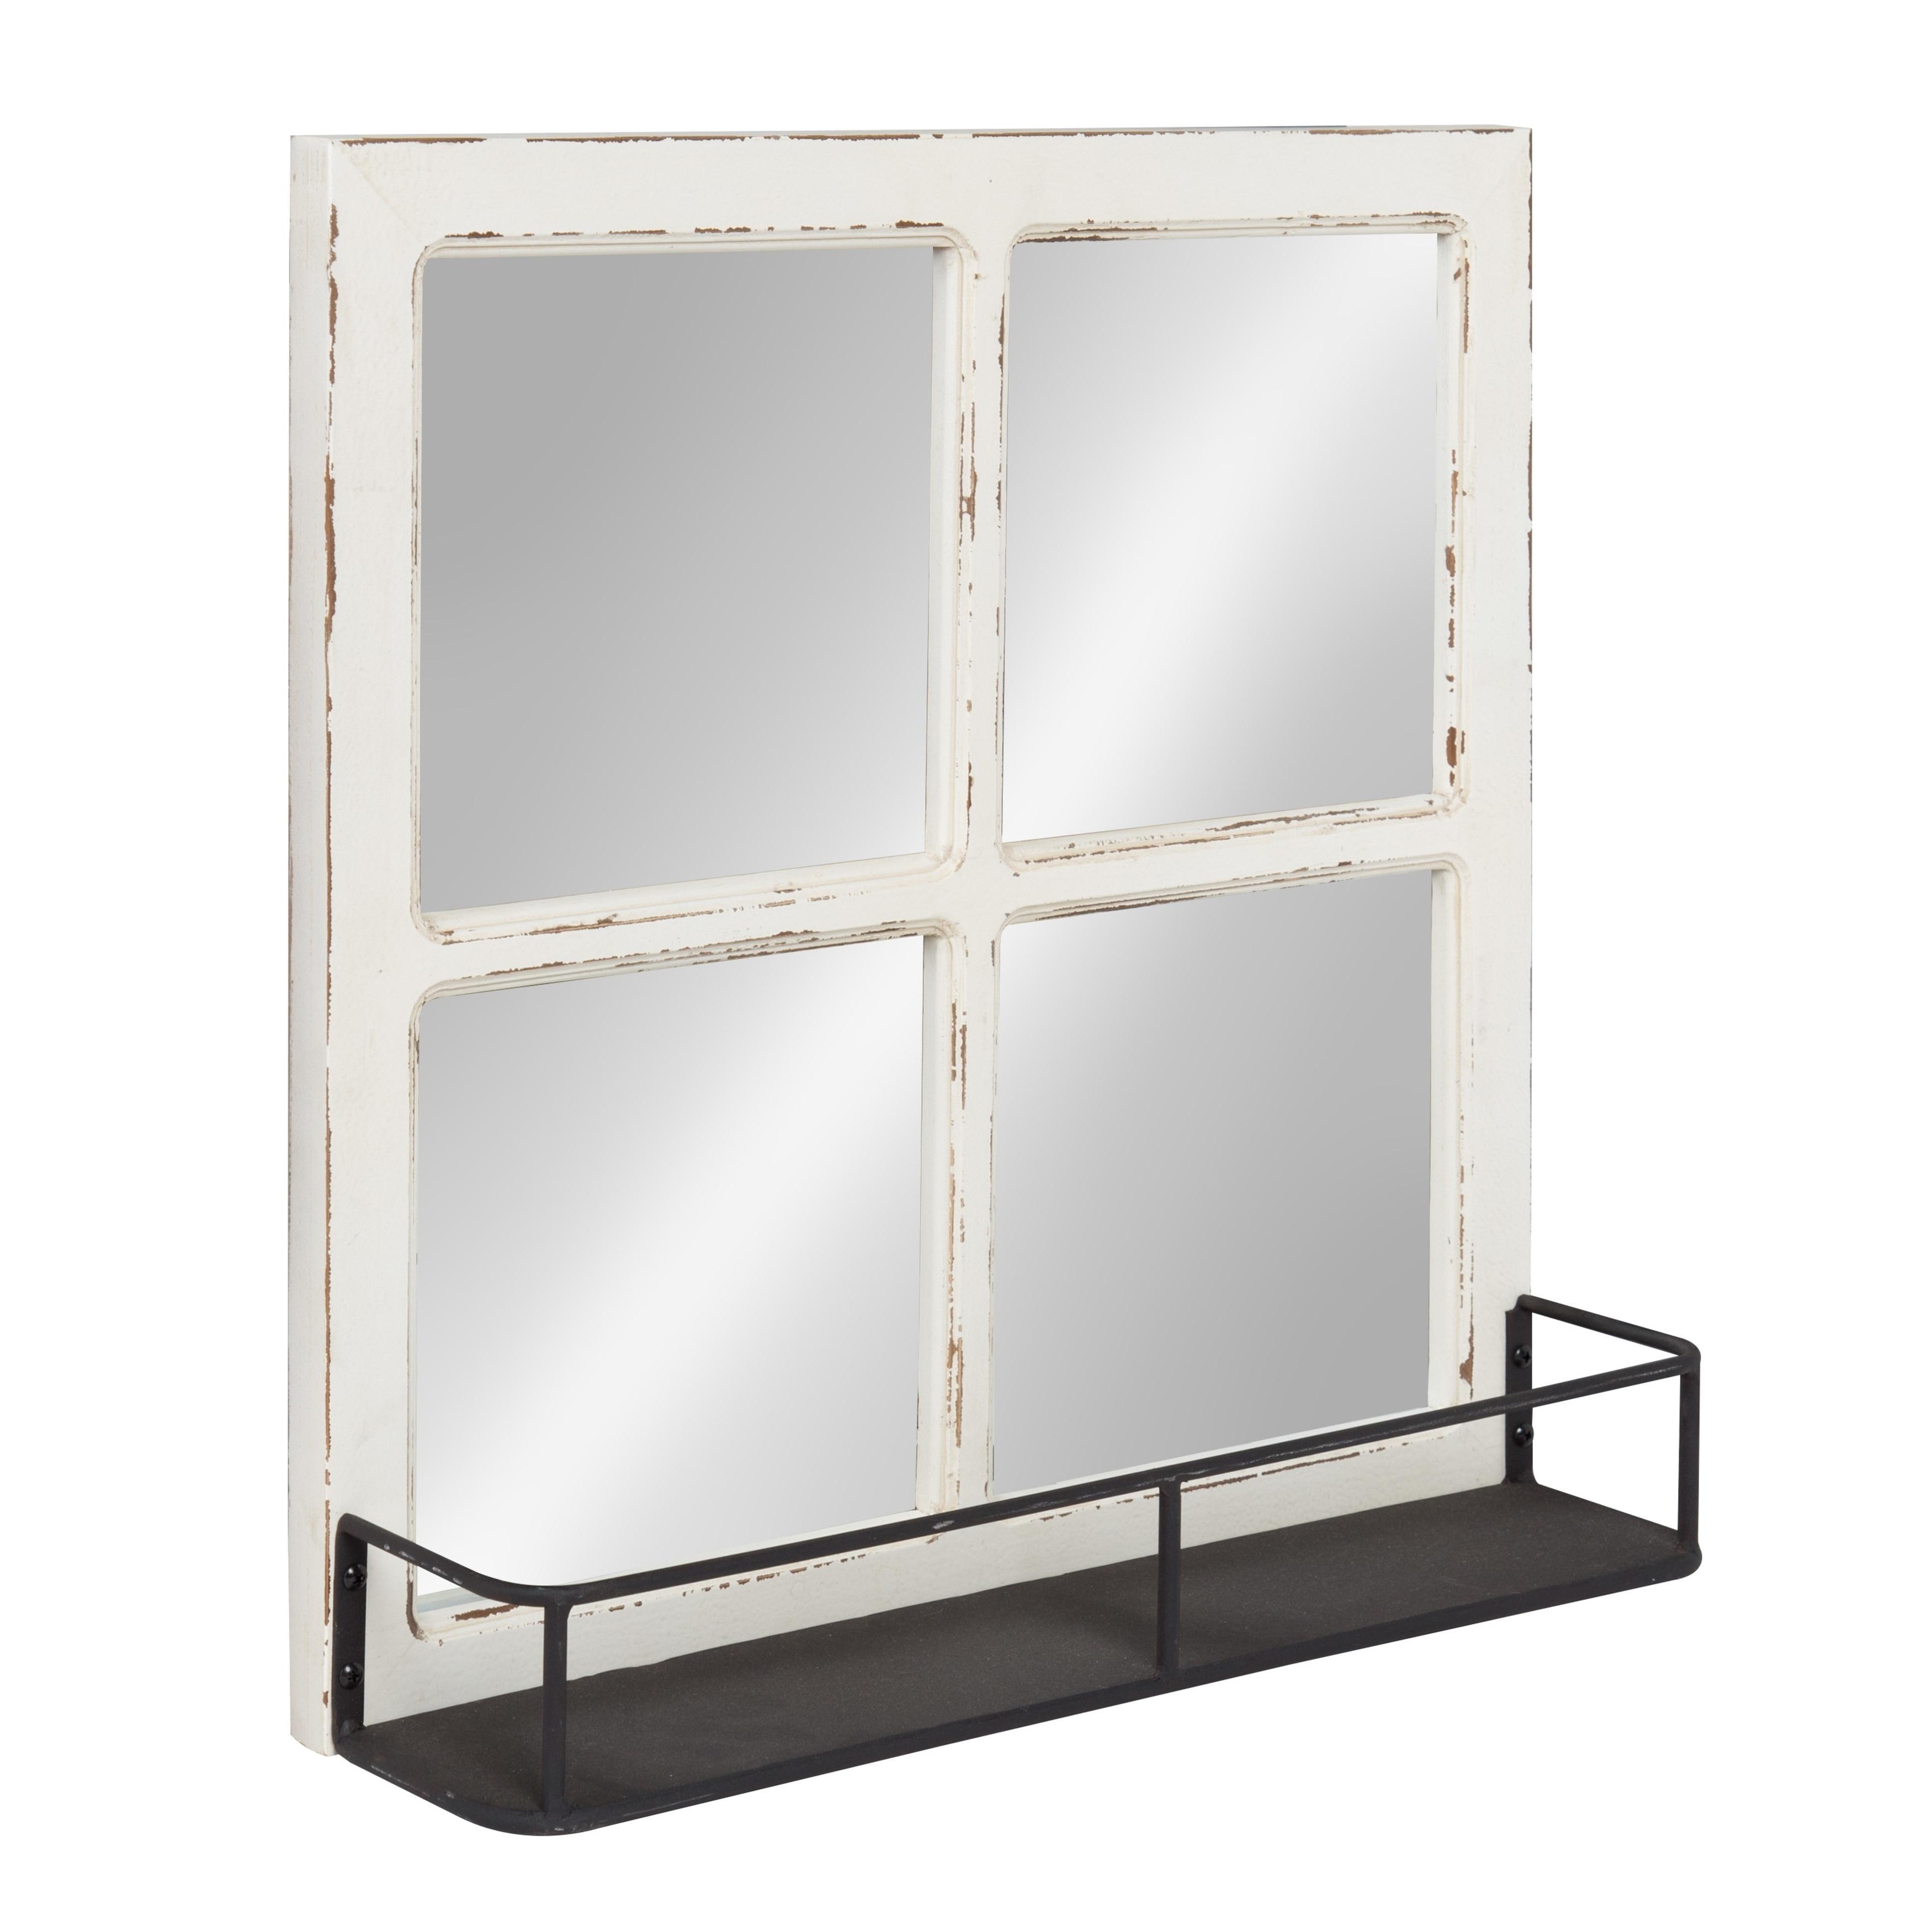 rectangular regard wall frameless bathroom x mounted stylish mirror with modern shelf to size